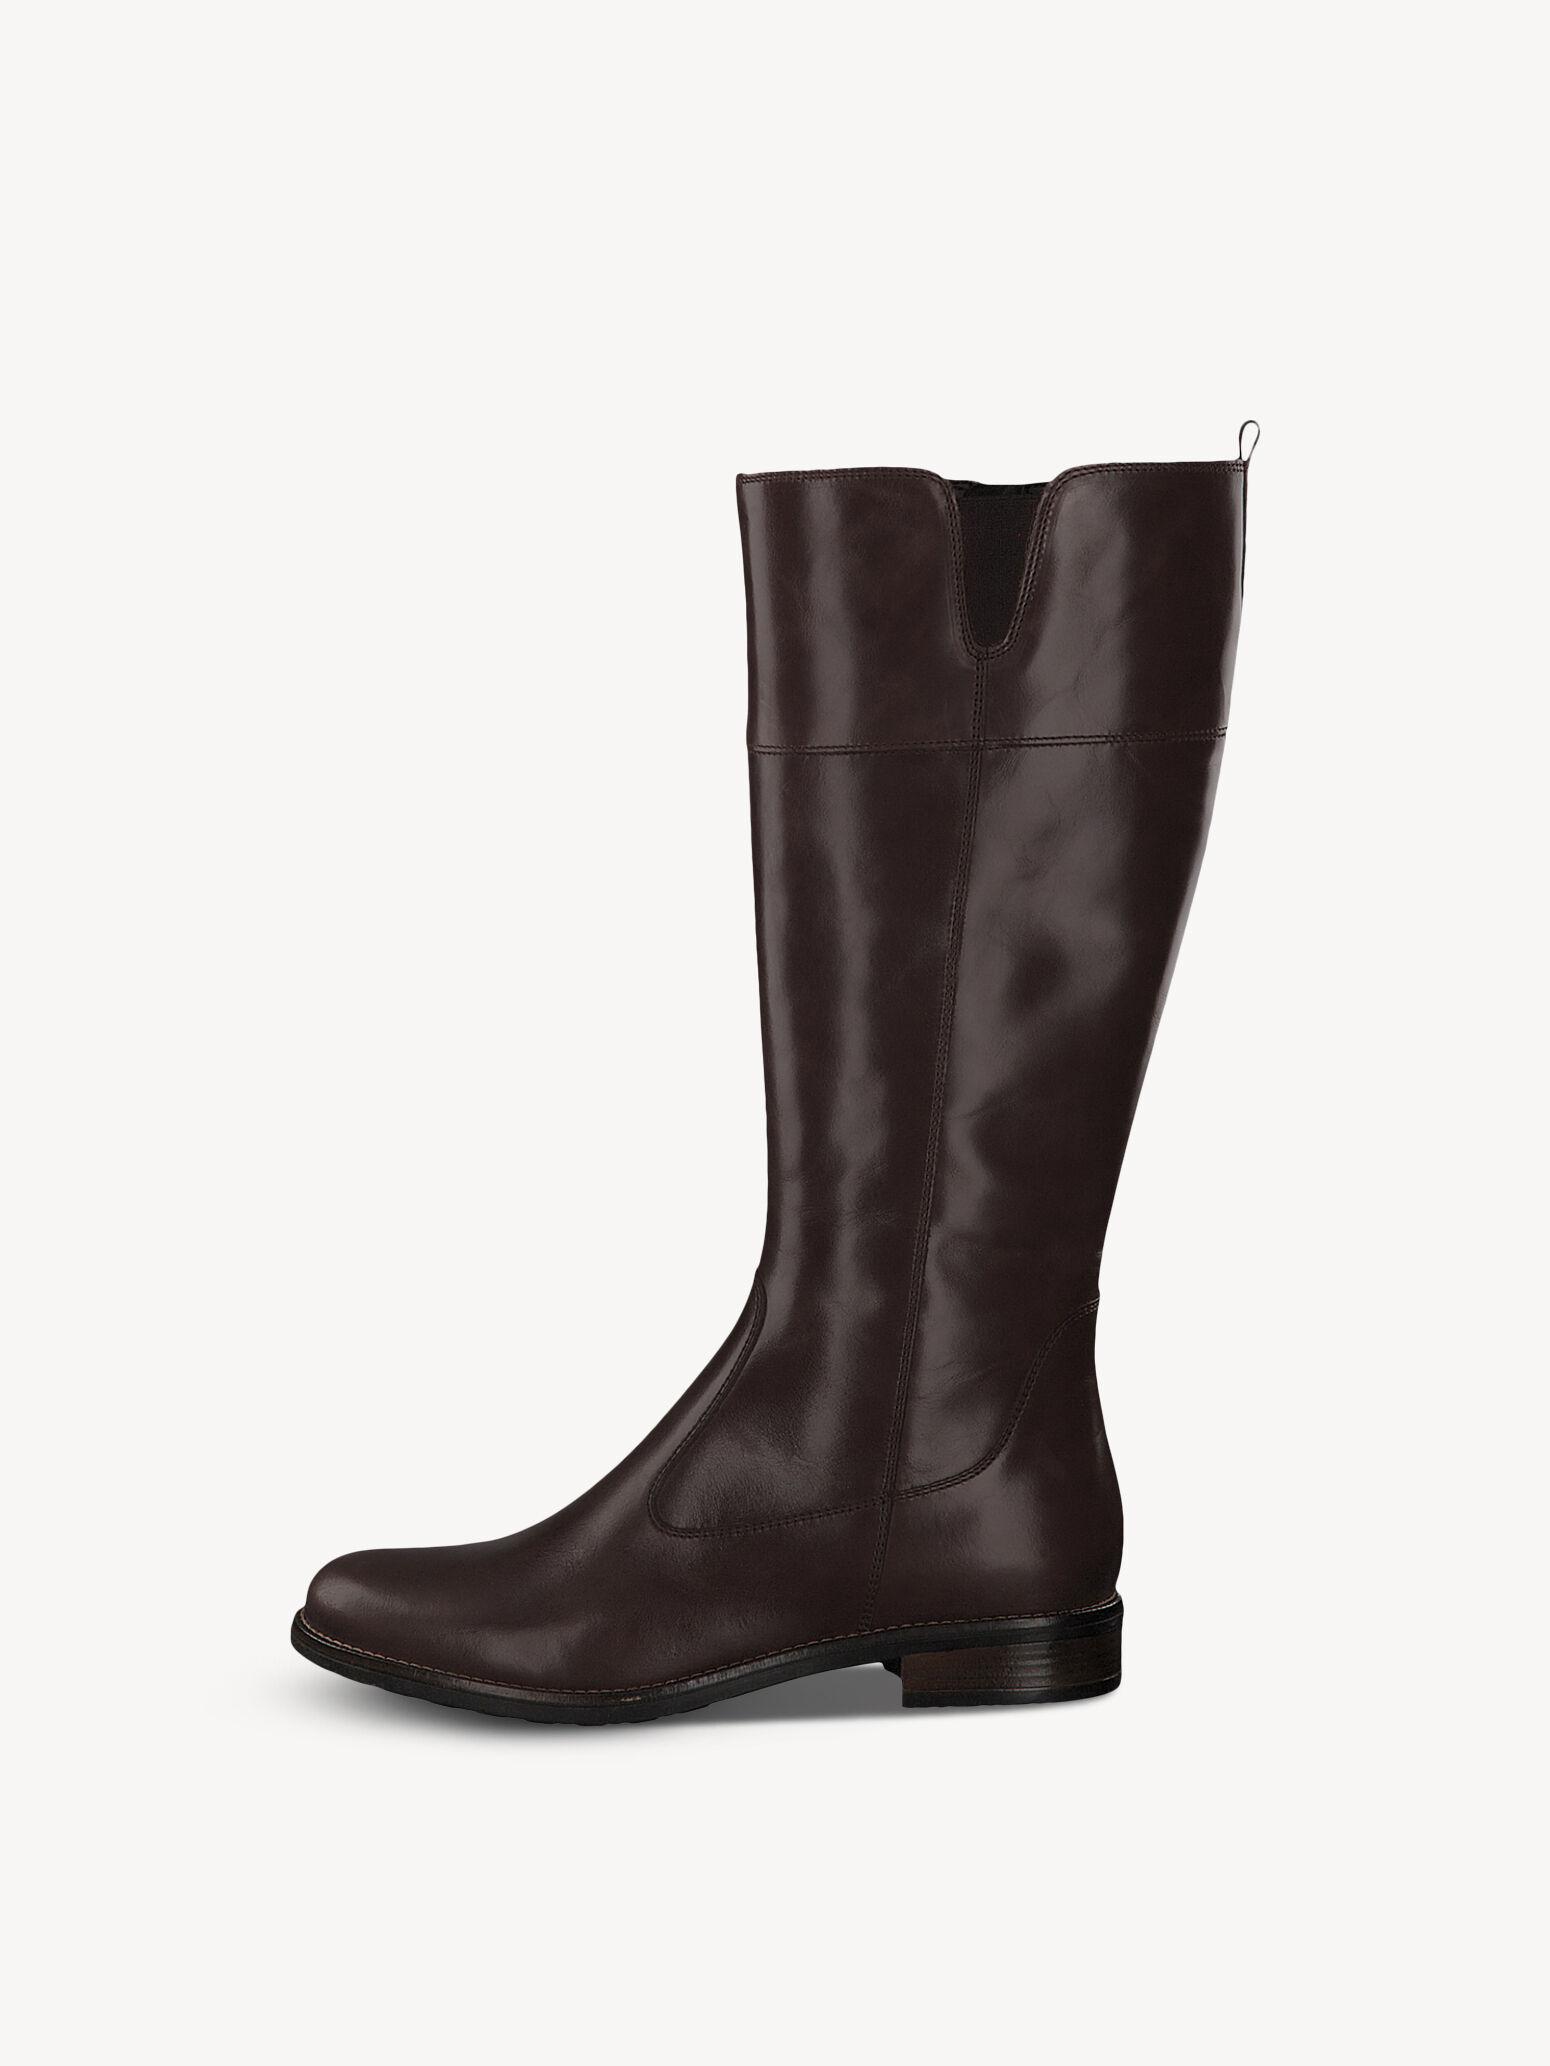 Stiefel TAMARIS 1 25542 23 Black 001